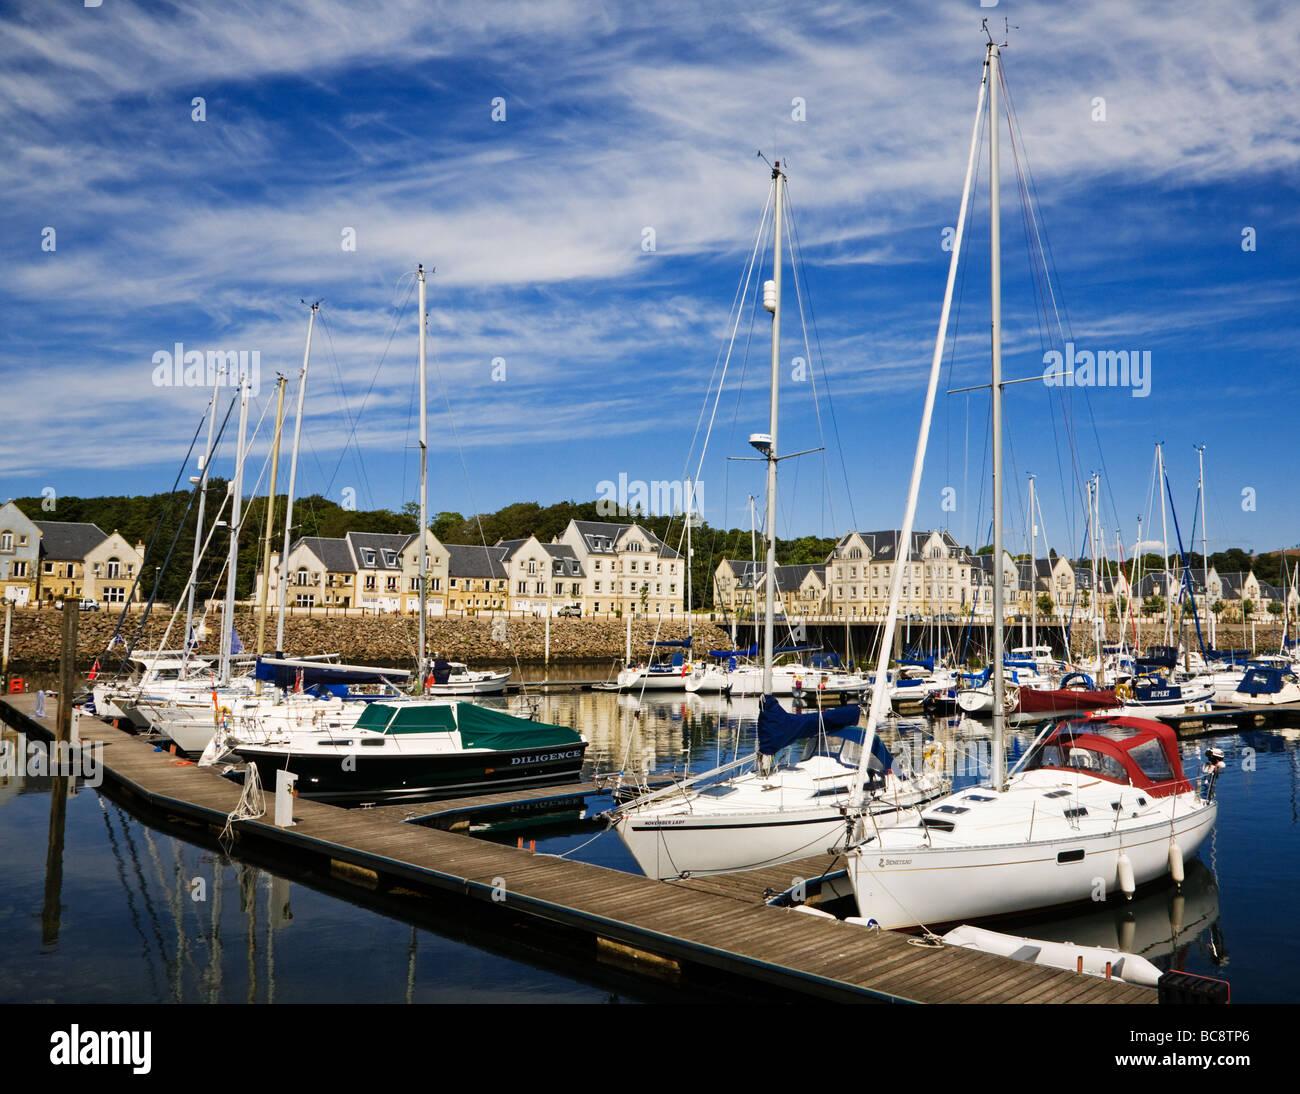 Inverkip Marina, Inverkip, North Ayrshire, Scotland. - Stock Image